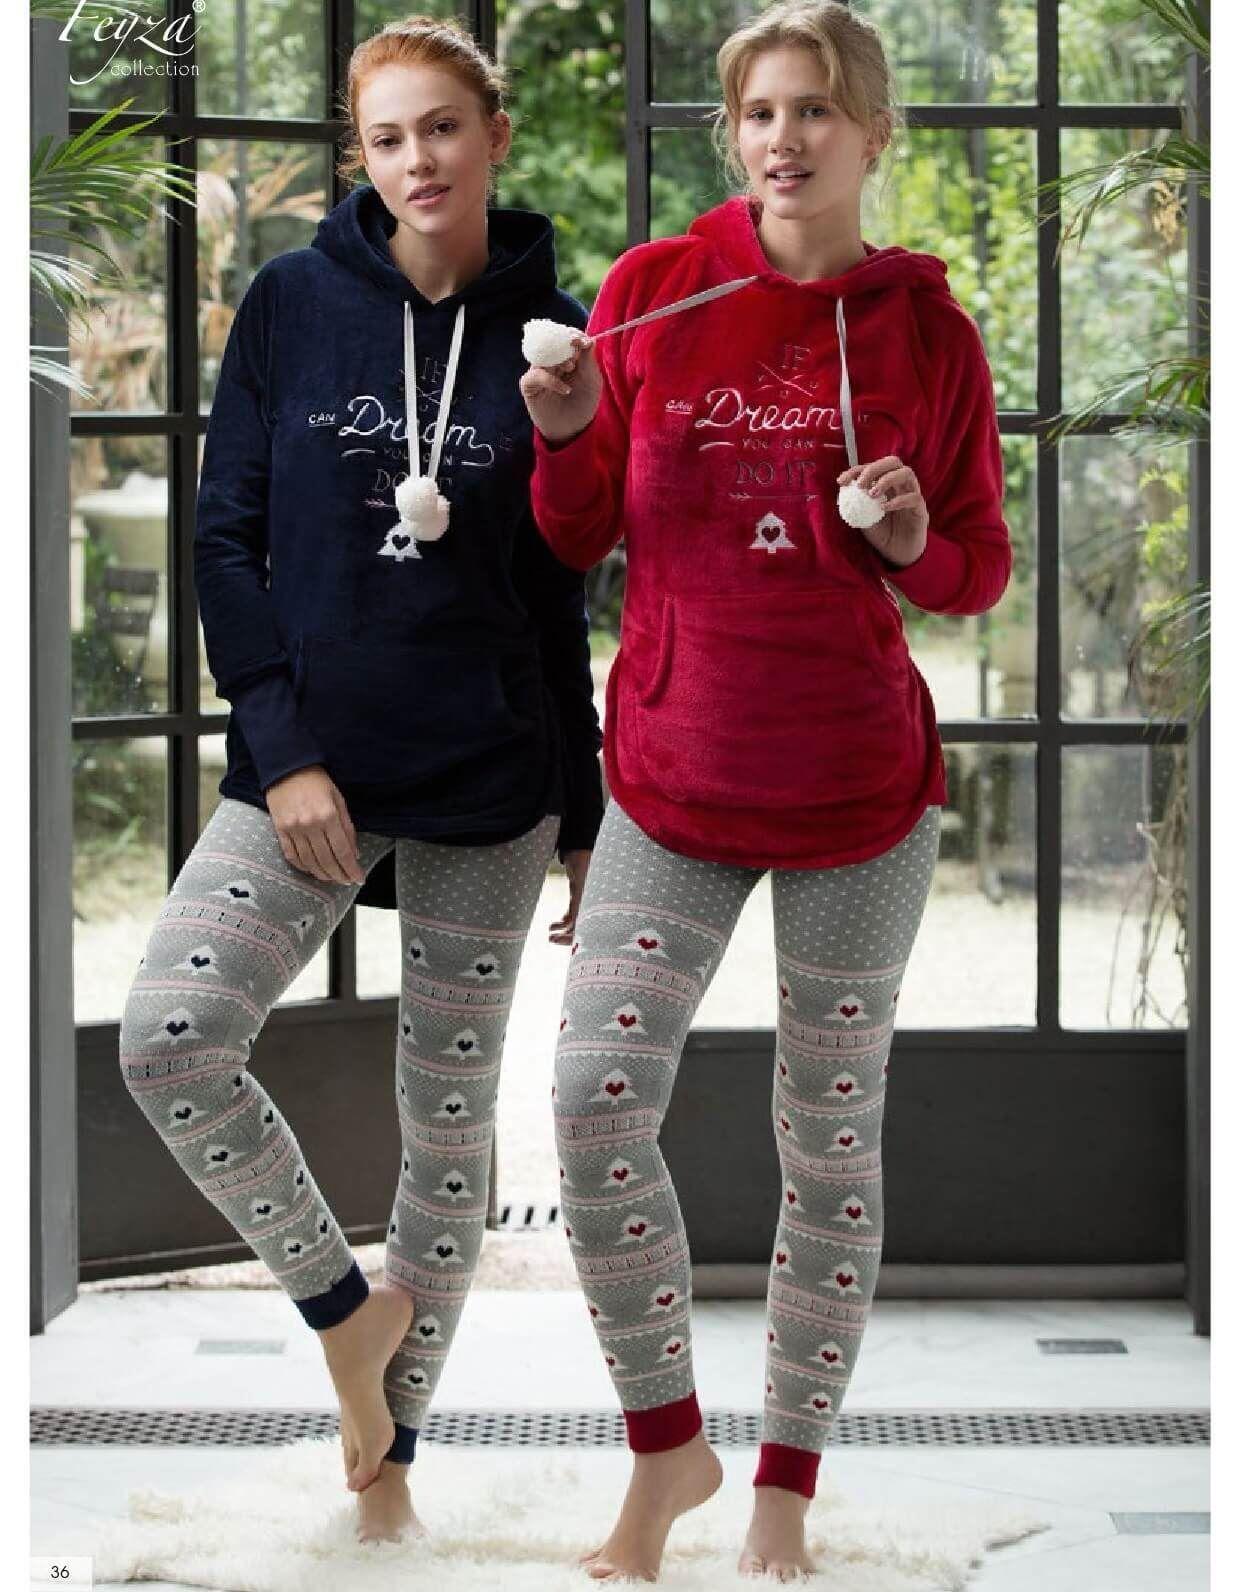 Feyza 3148 Triko Taytli Polar Bayan Takim Hediyelikler Kadin Giyim Hediyelik Yilbasihediyesi Yilbasihedi Sports Wear Women Girls Activewear Pajamas Women